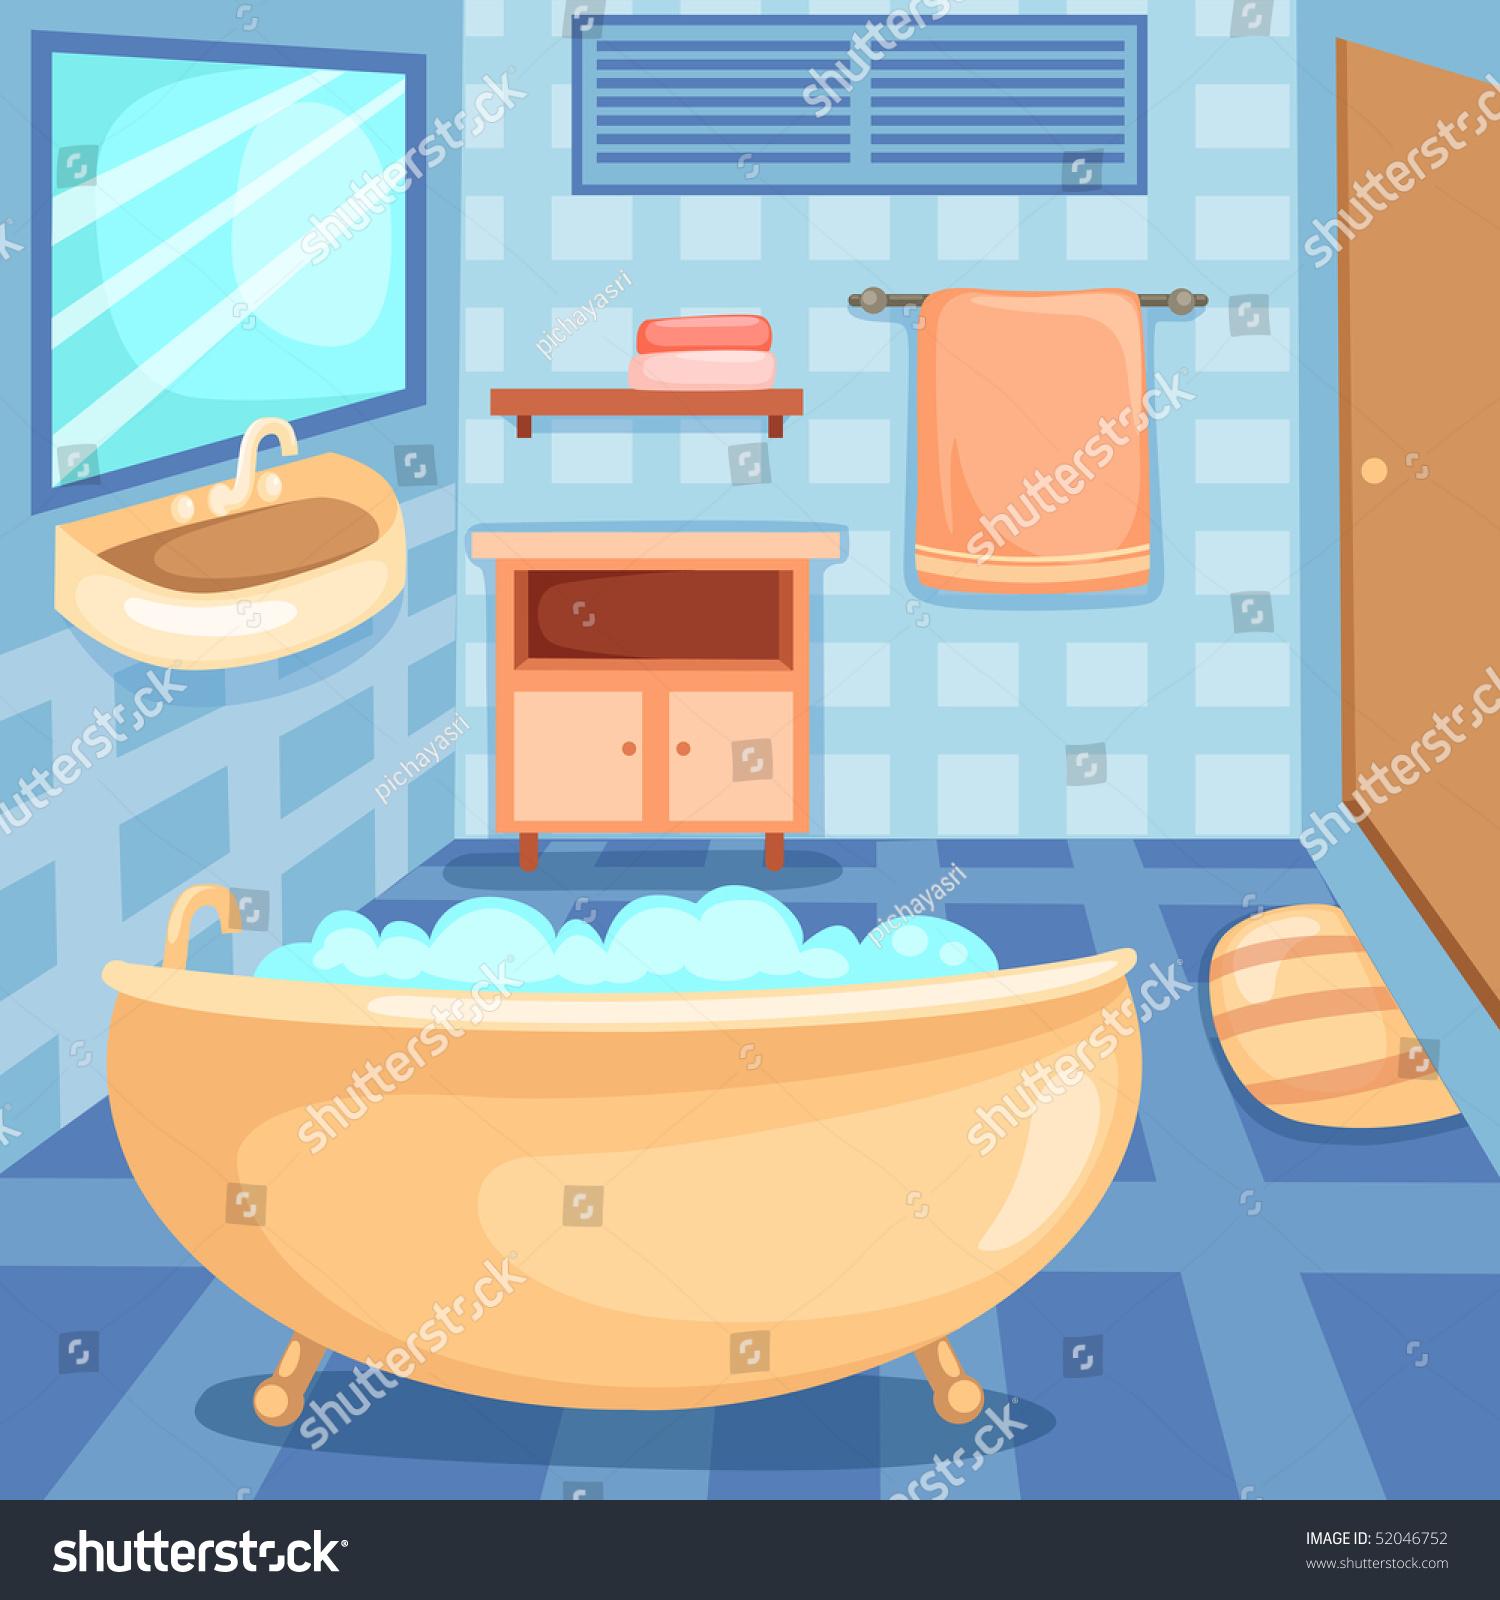 Illustration Cartoon Interior Bathroom Stock Illustration